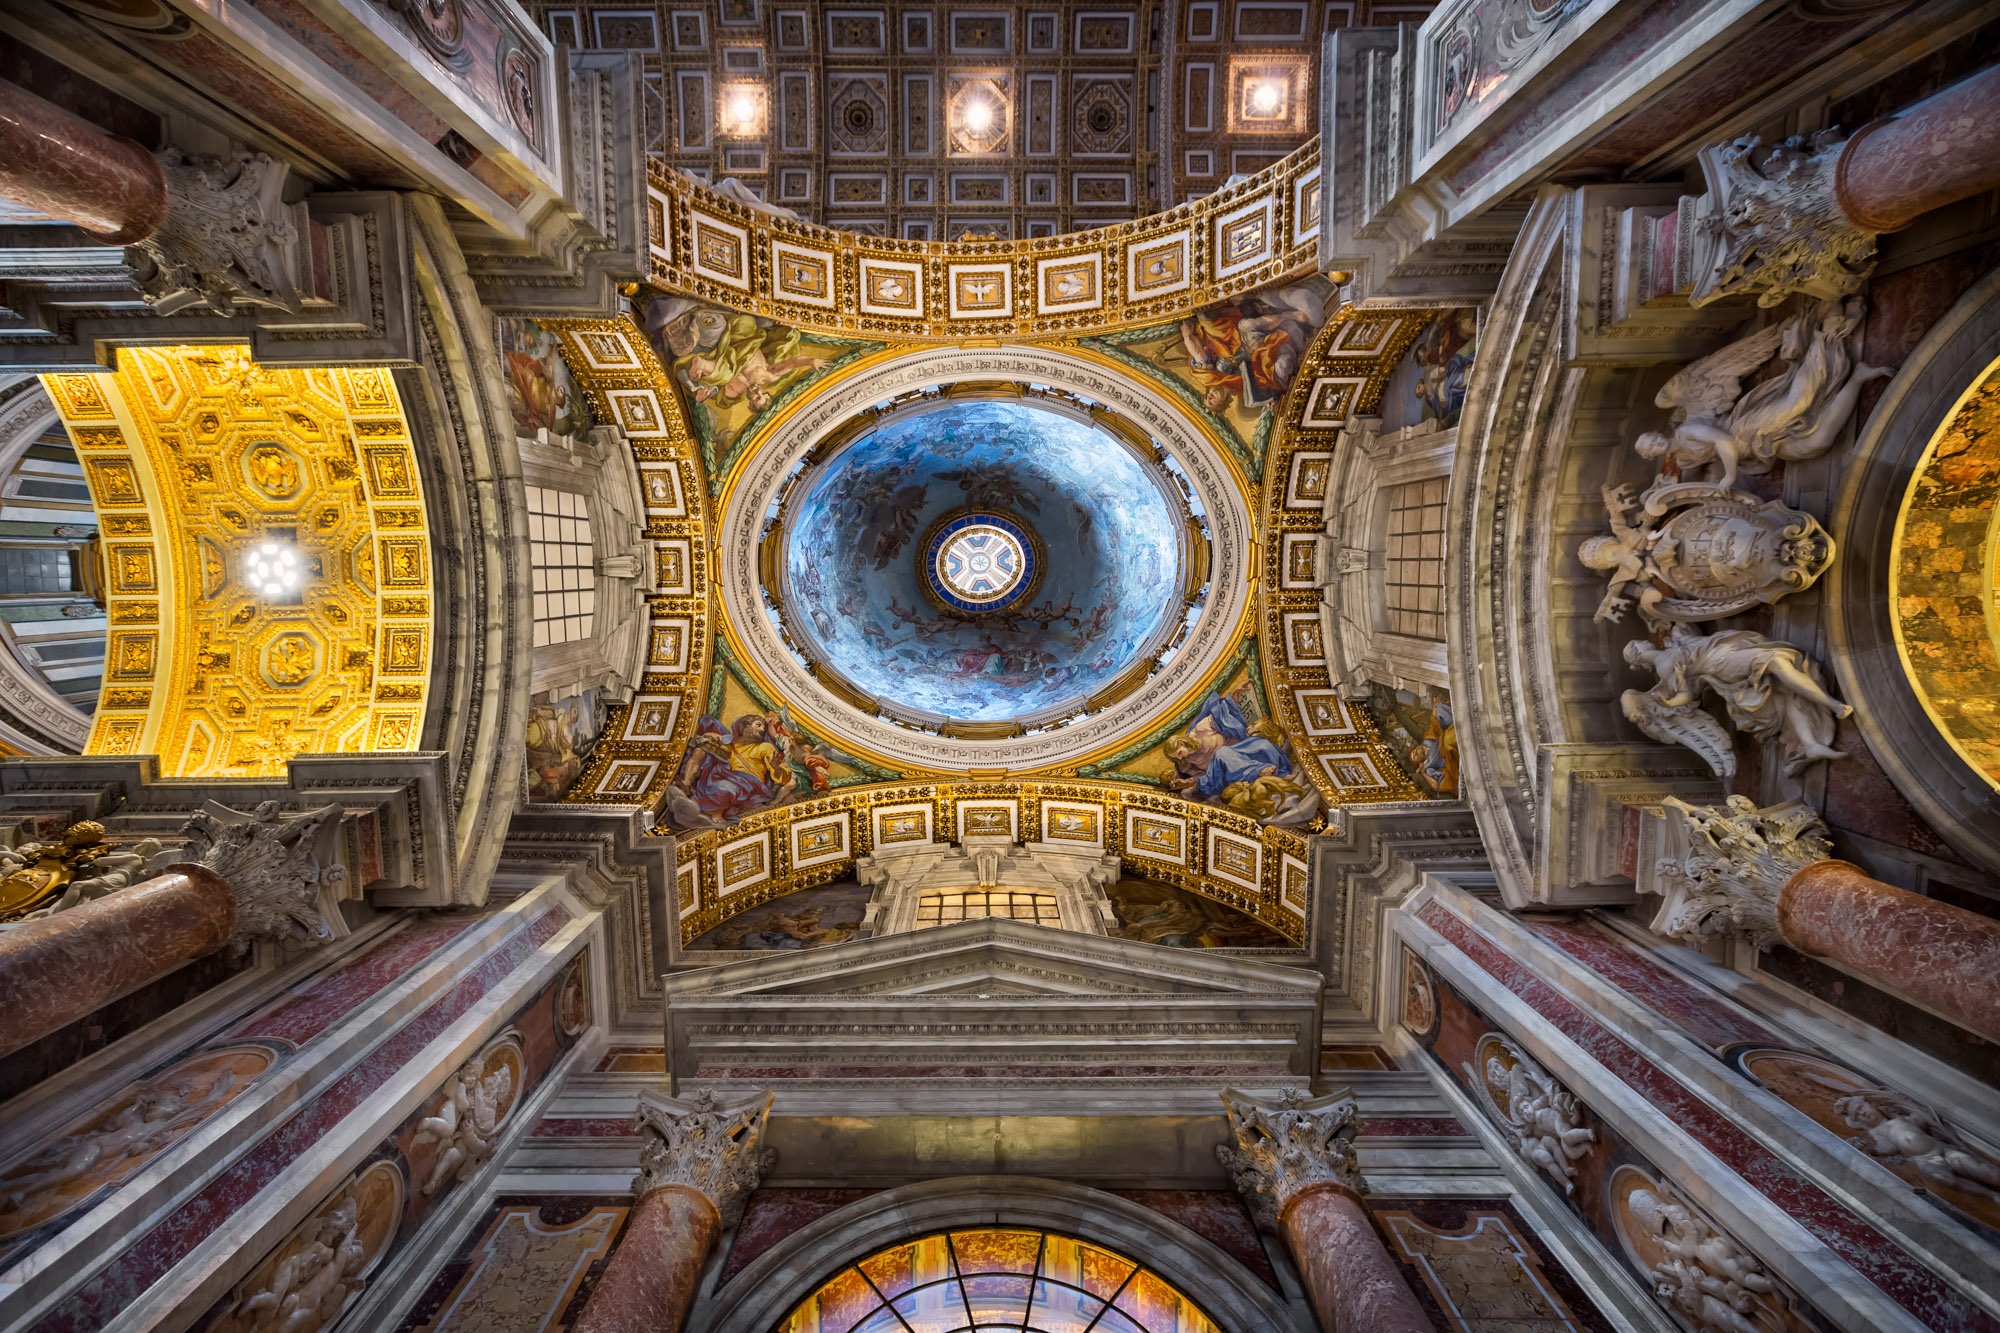 Interior of Saint Peter's Basilica, Rome, Italy